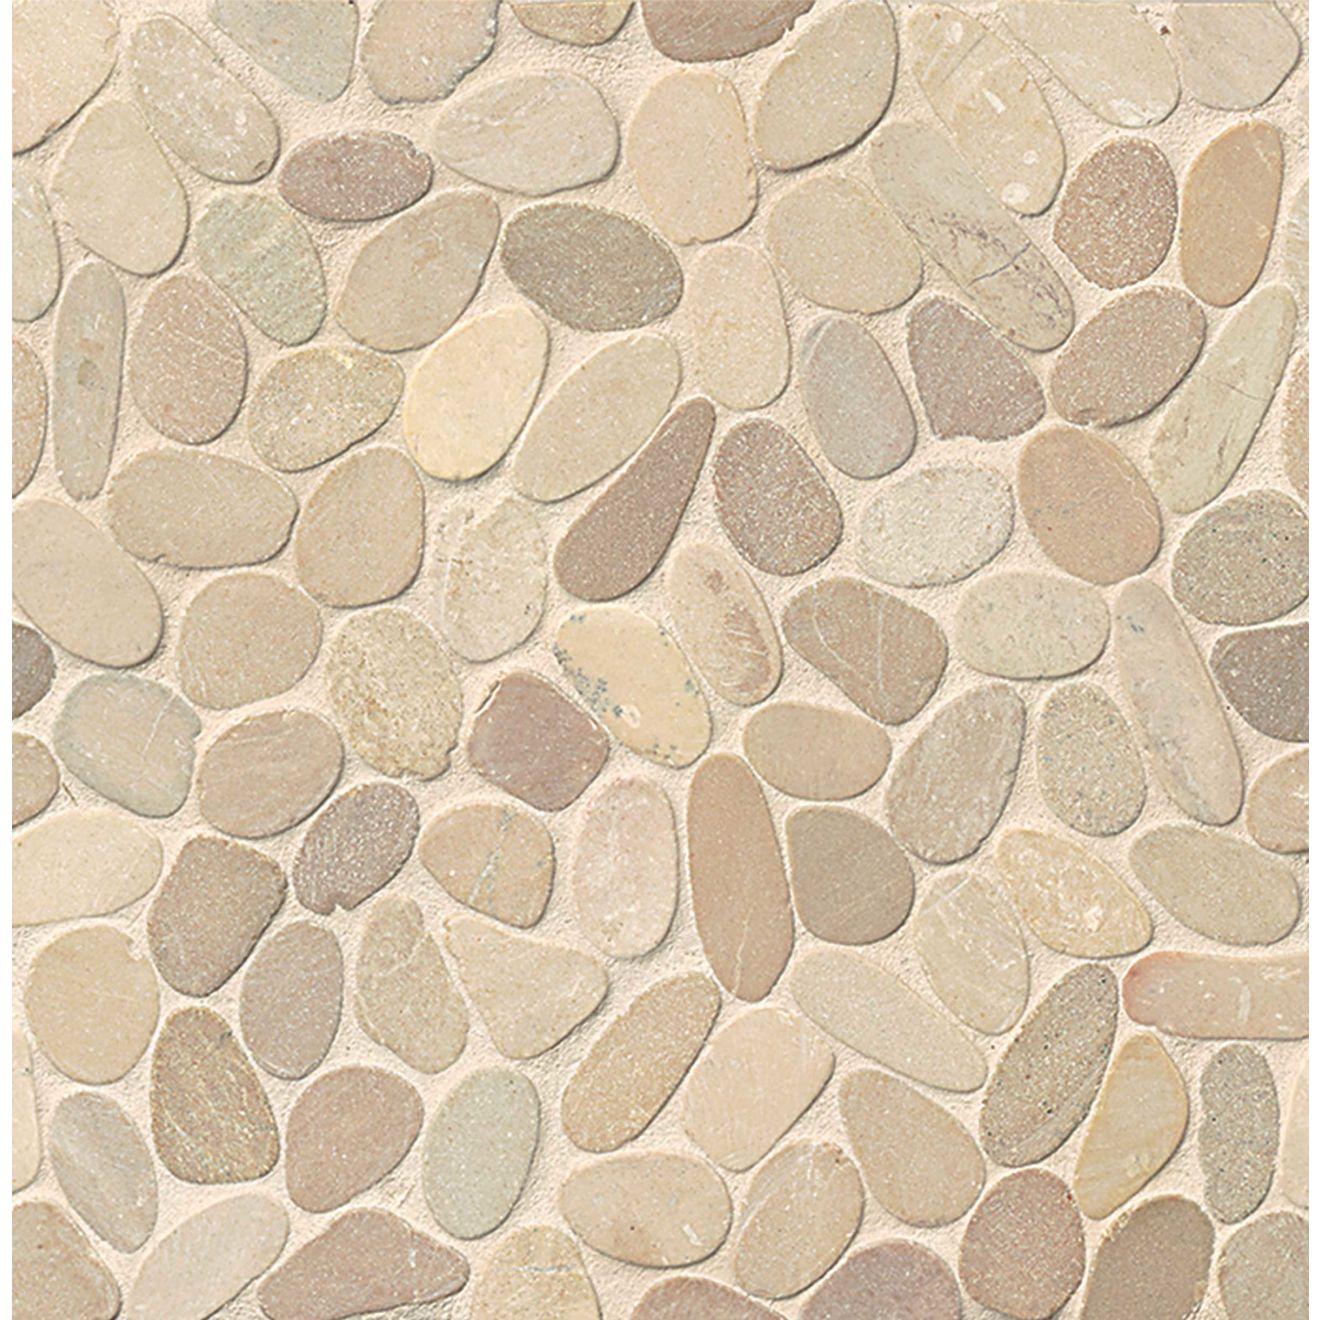 Hemisphere Floor & Wall Mosaic in Antigua